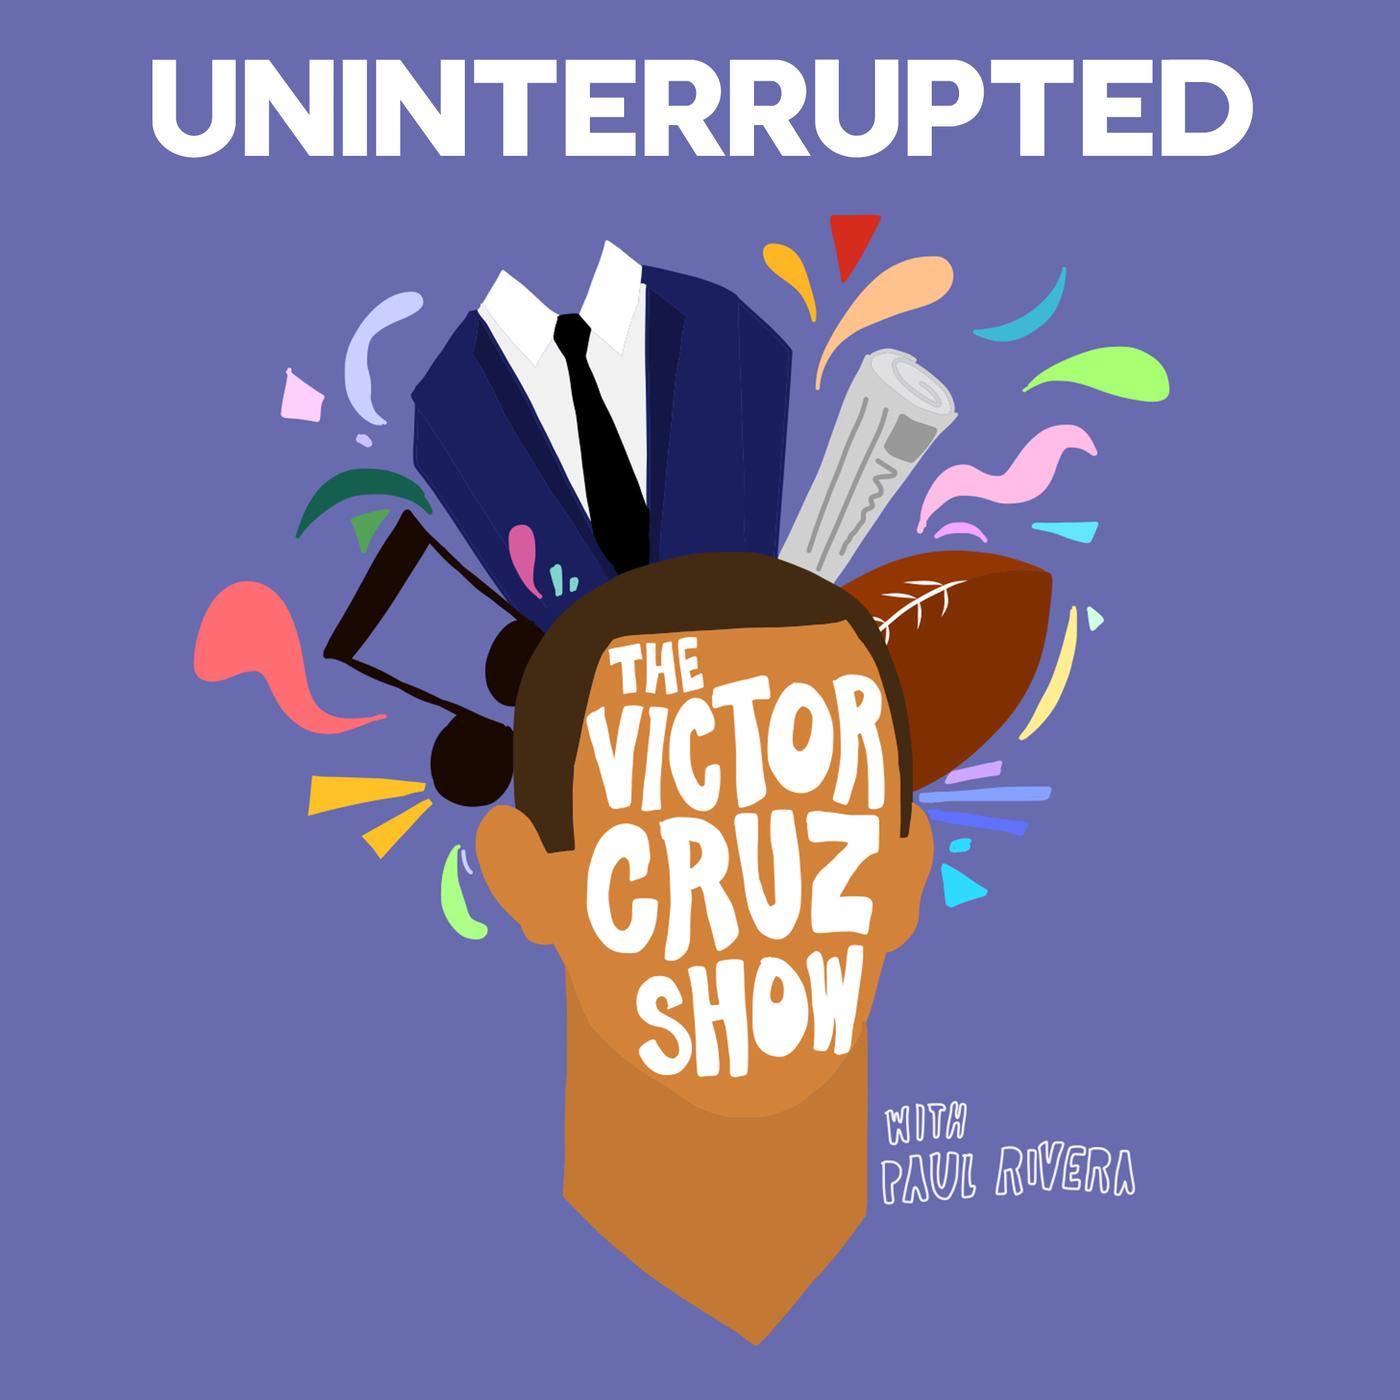 The Victor Cruz Show